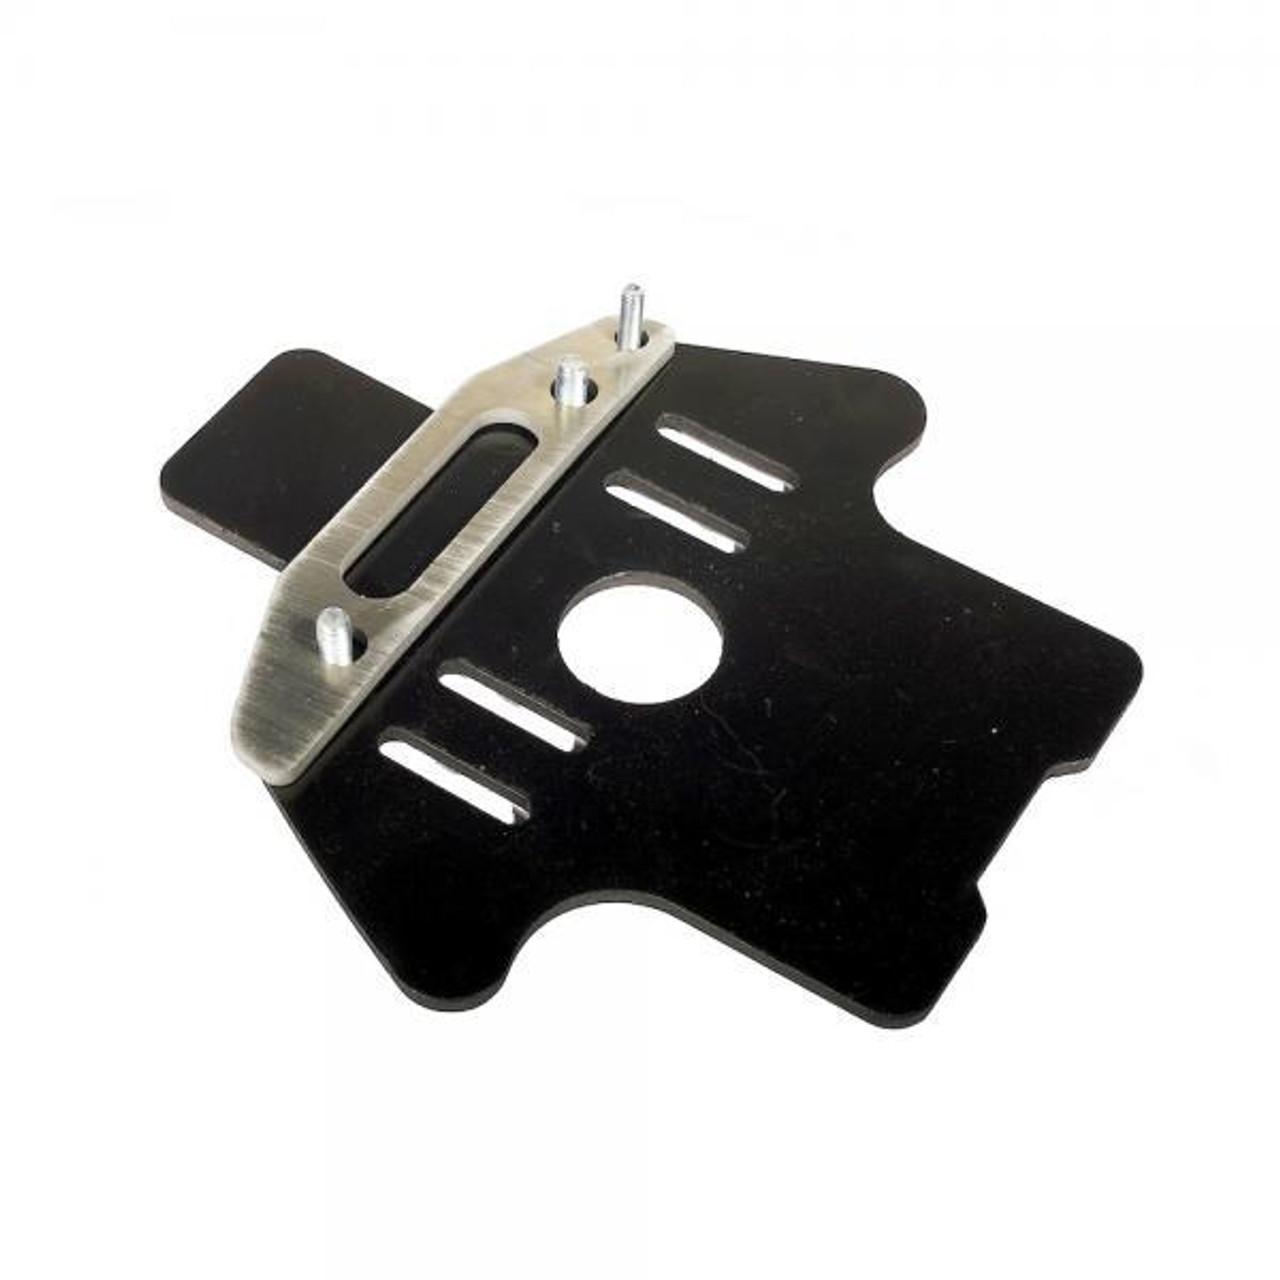 Protector linkage suspension